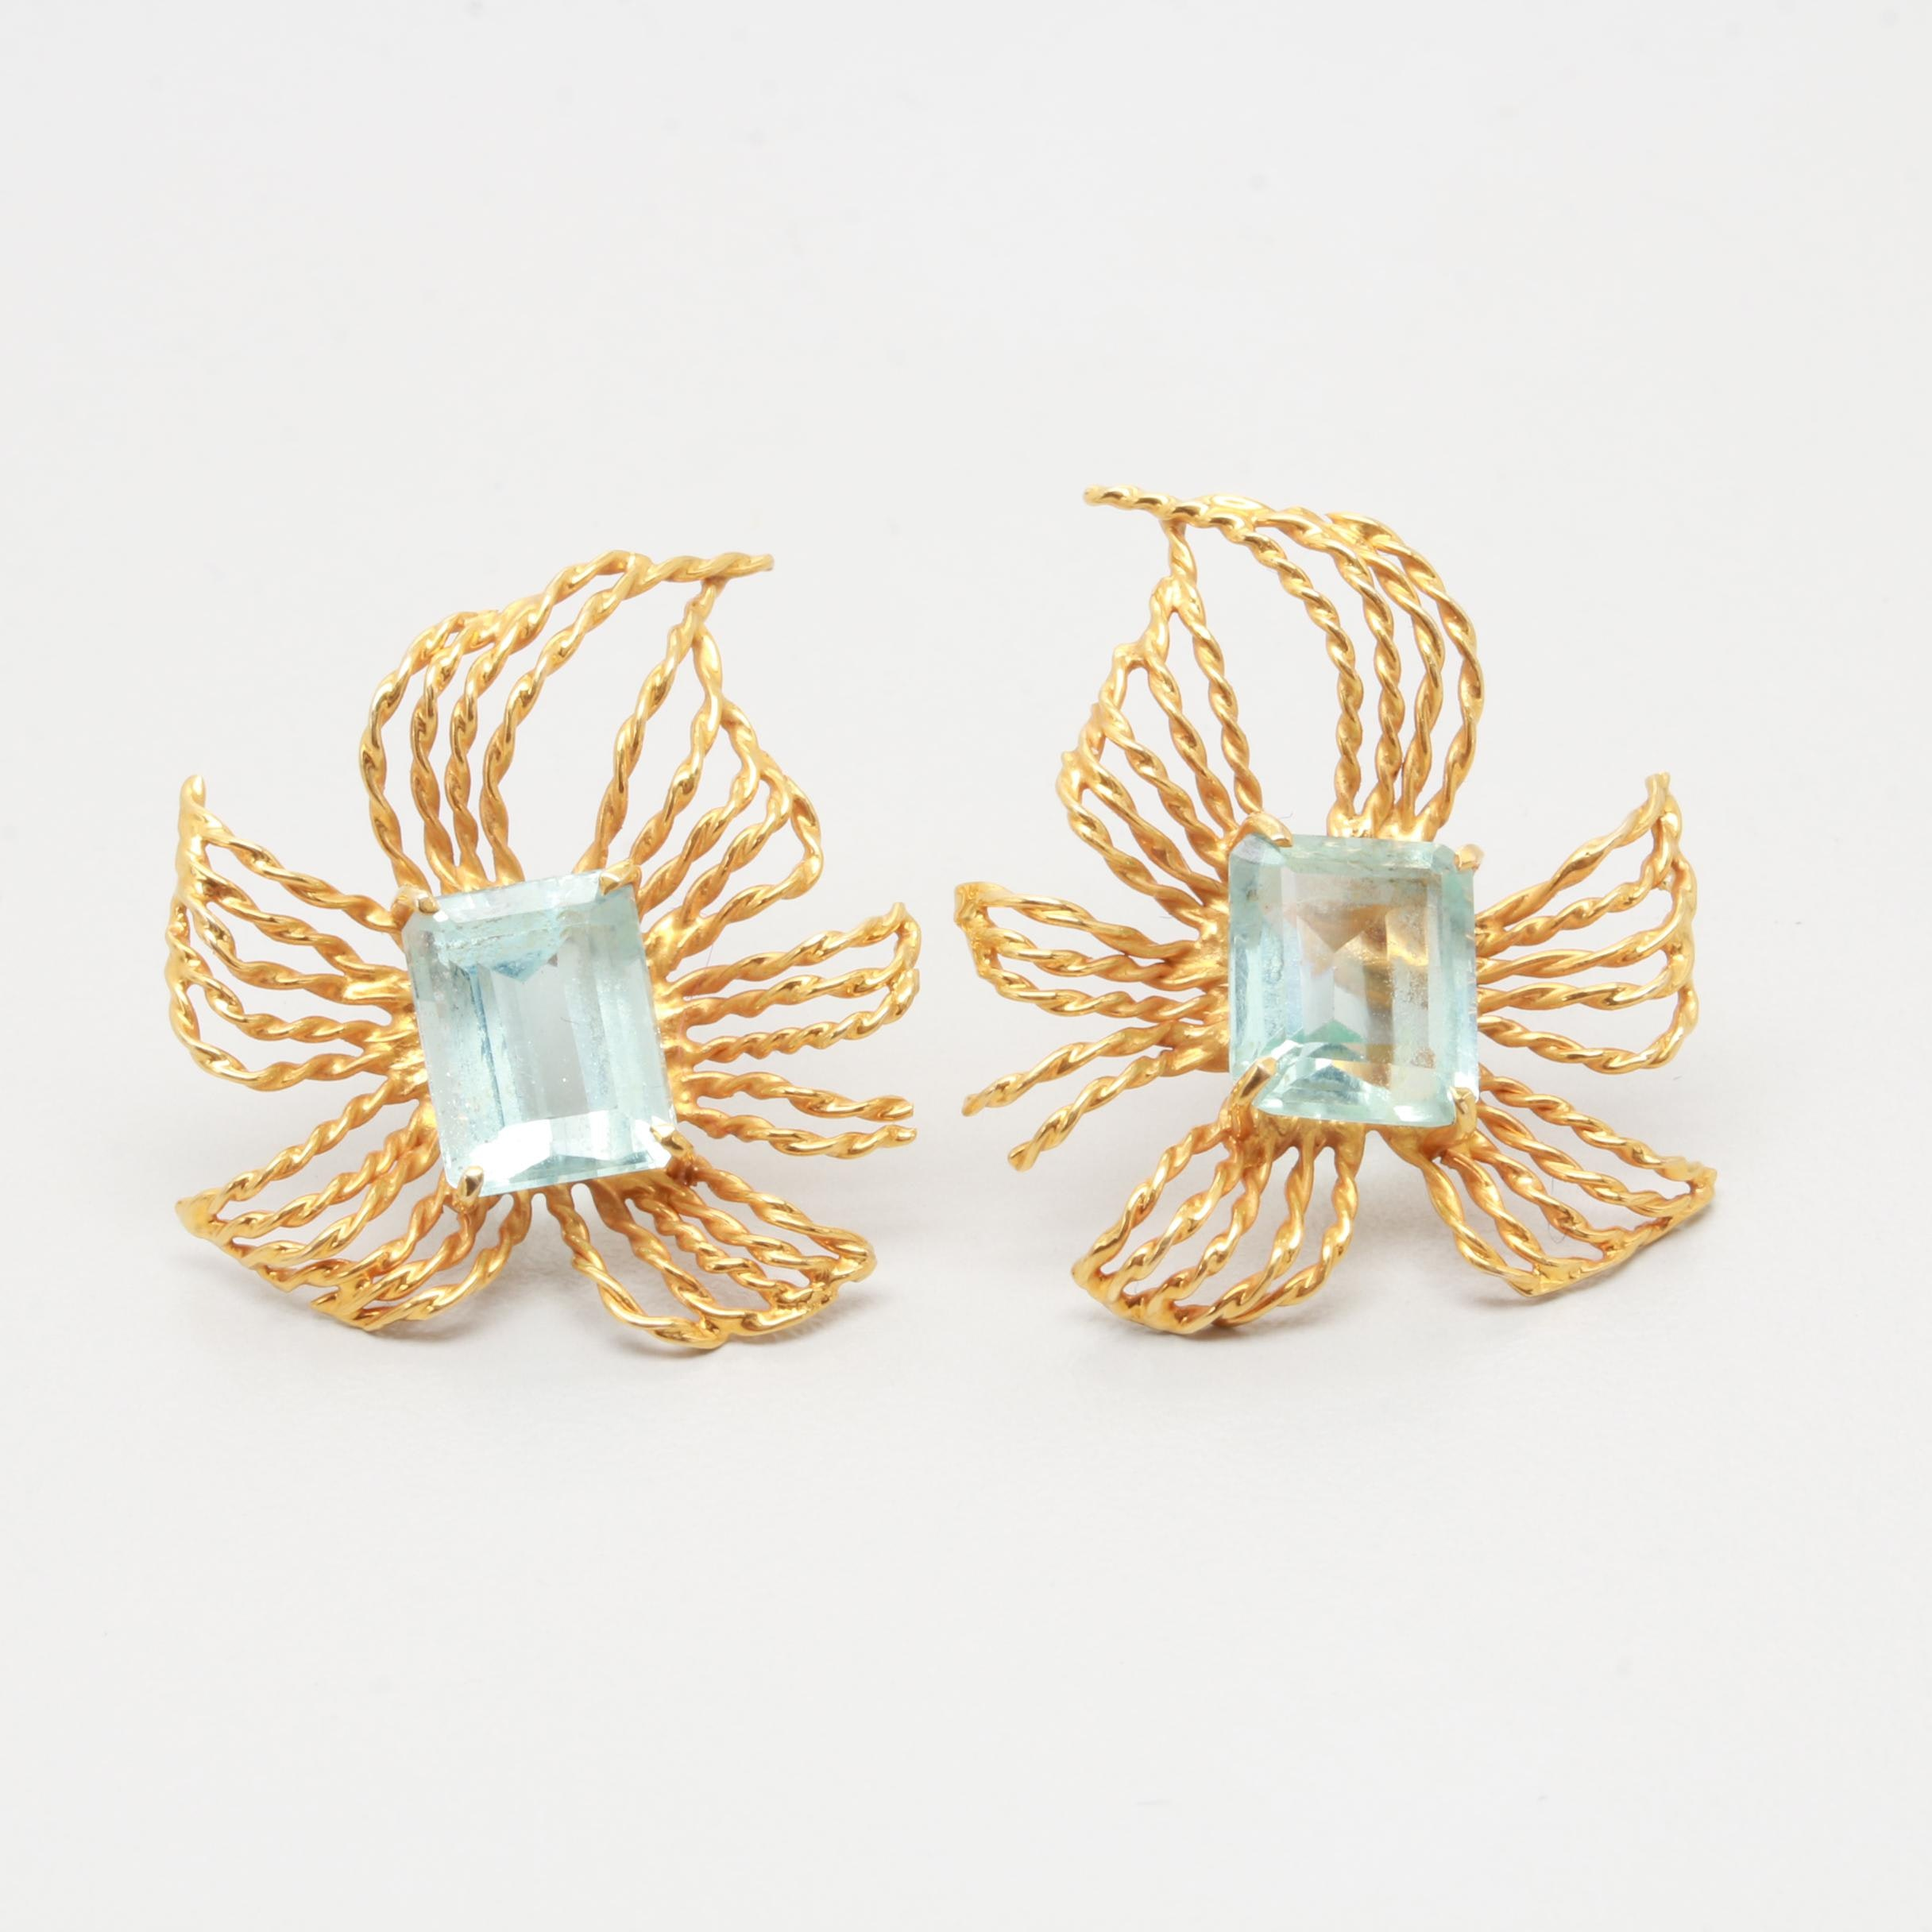 Vintage 14K Yellow Gold Aquamarine Earrings